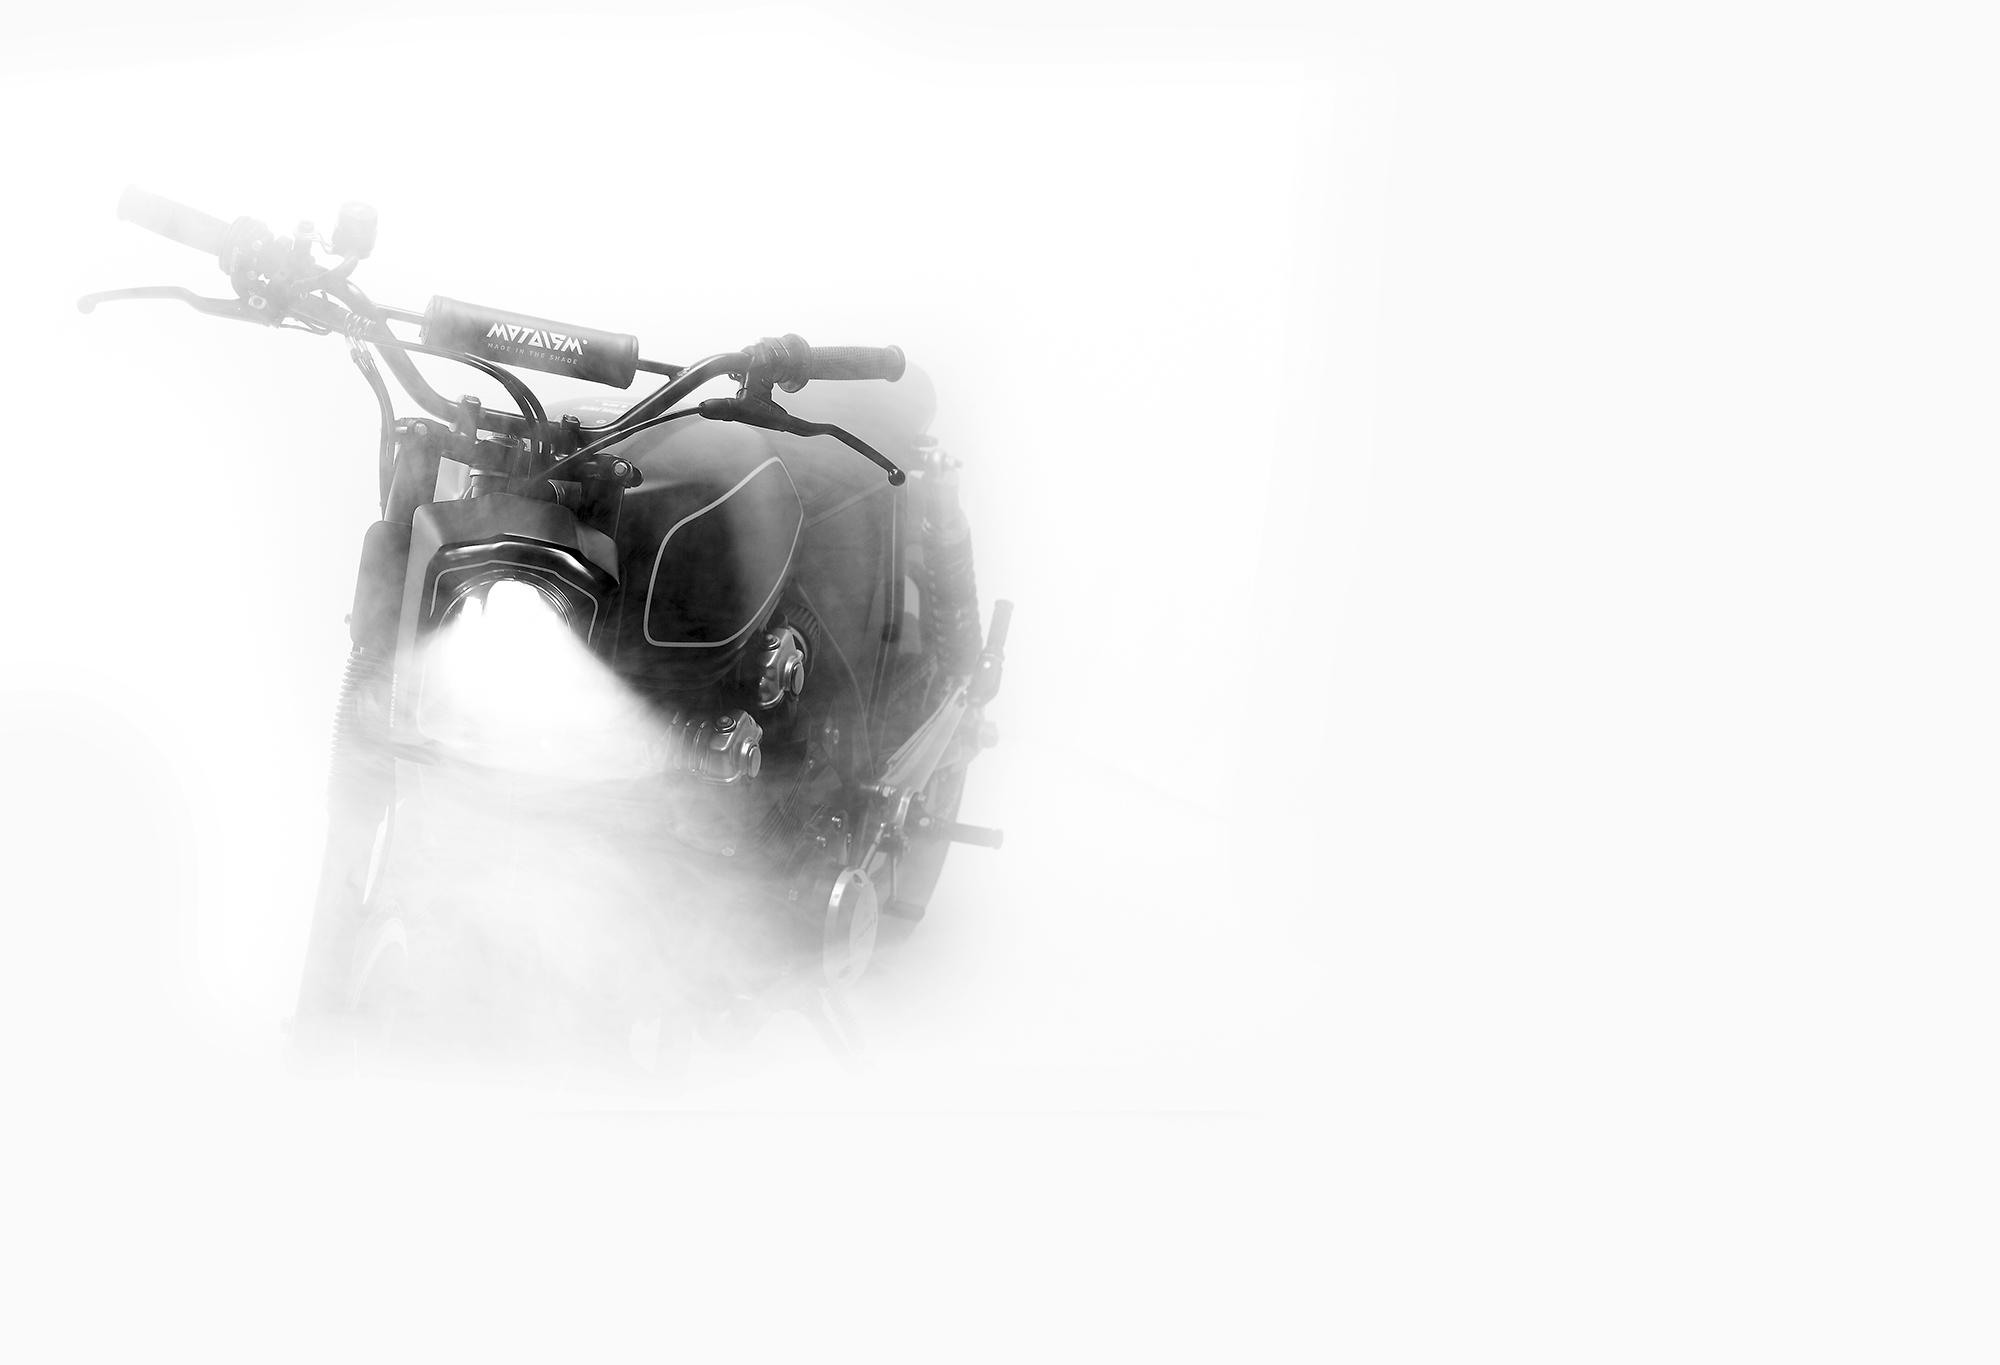 Motoism_Starrider_Studio_LudwigMaierPhotography2710